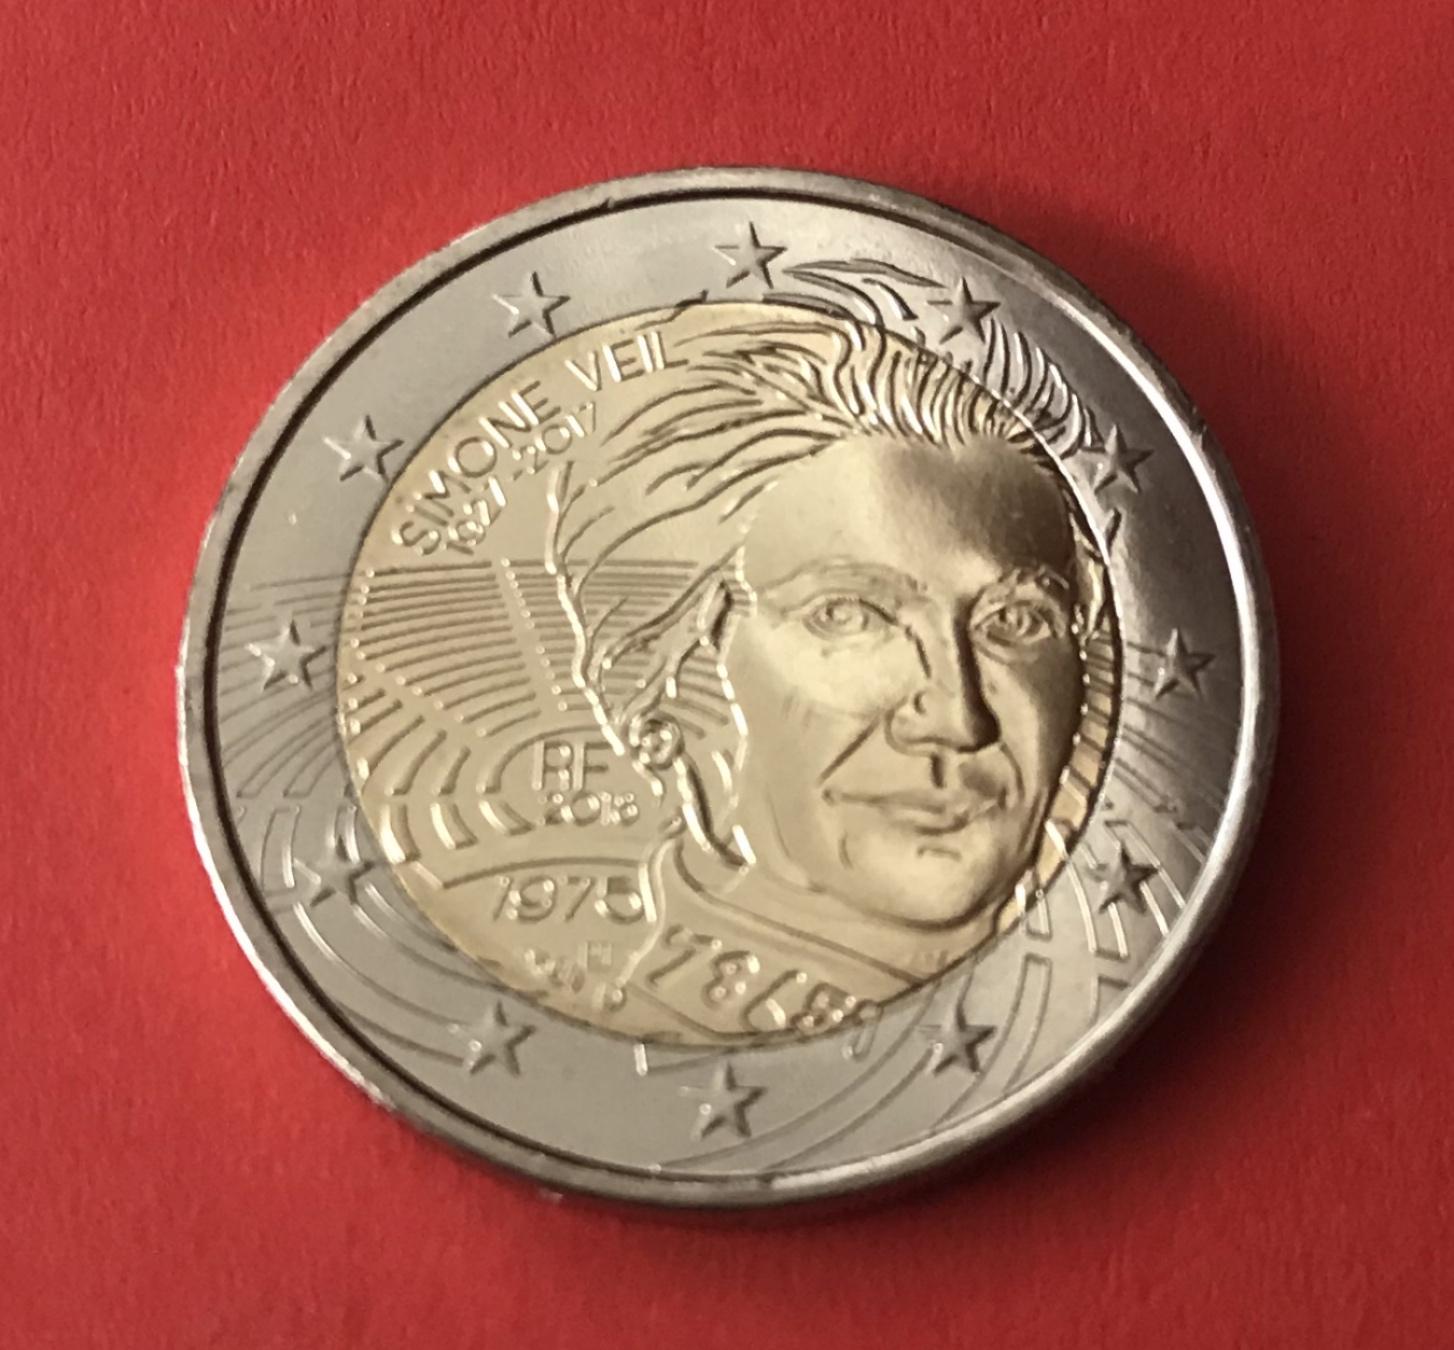 2 Euro Gedenkmünze Frankreich 2018 Simone Veil Muenzhandel Kissercom